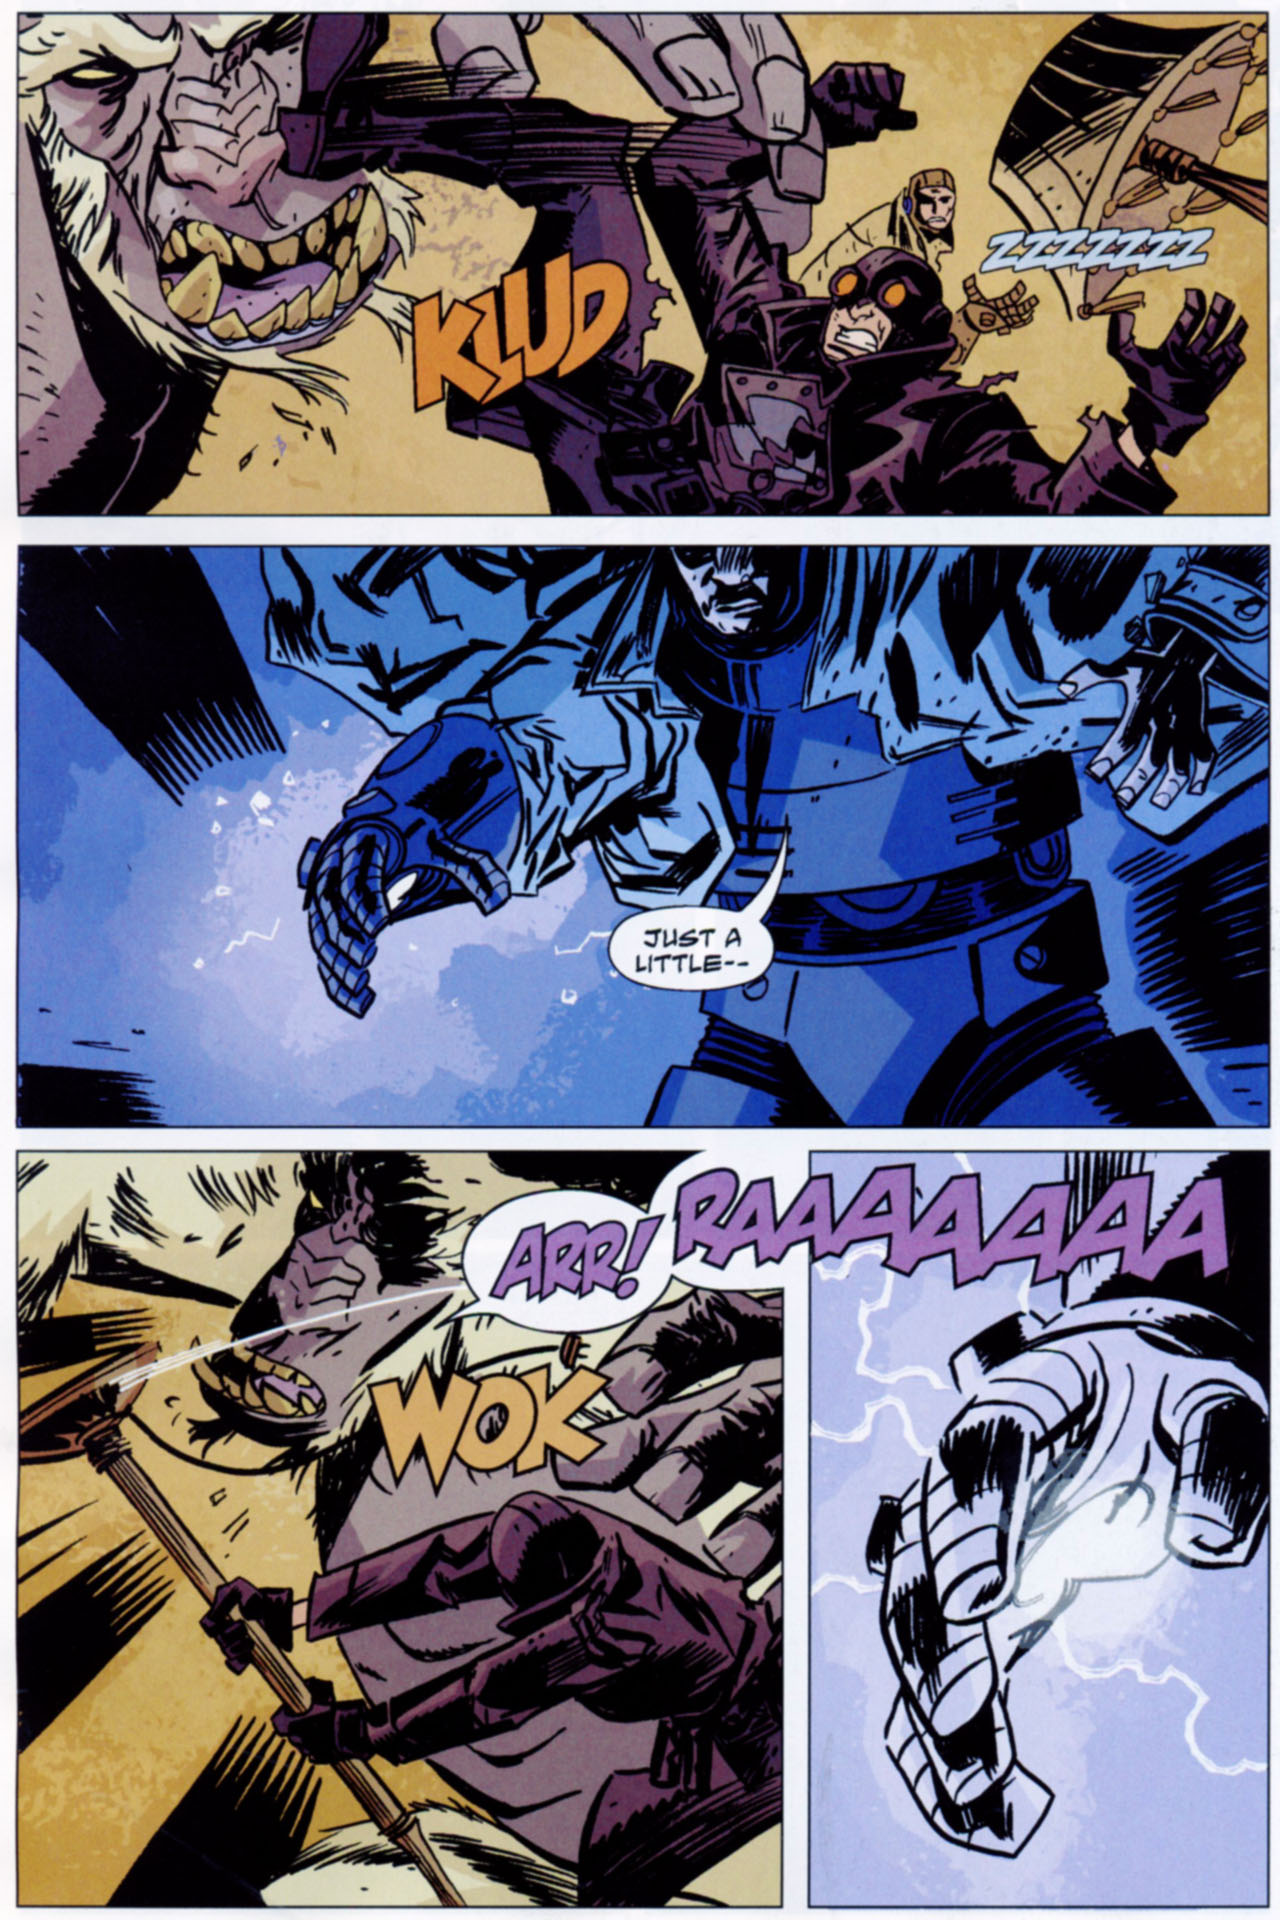 Read online Lobster Johnson: The Iron Prometheus comic -  Issue #1 - 9